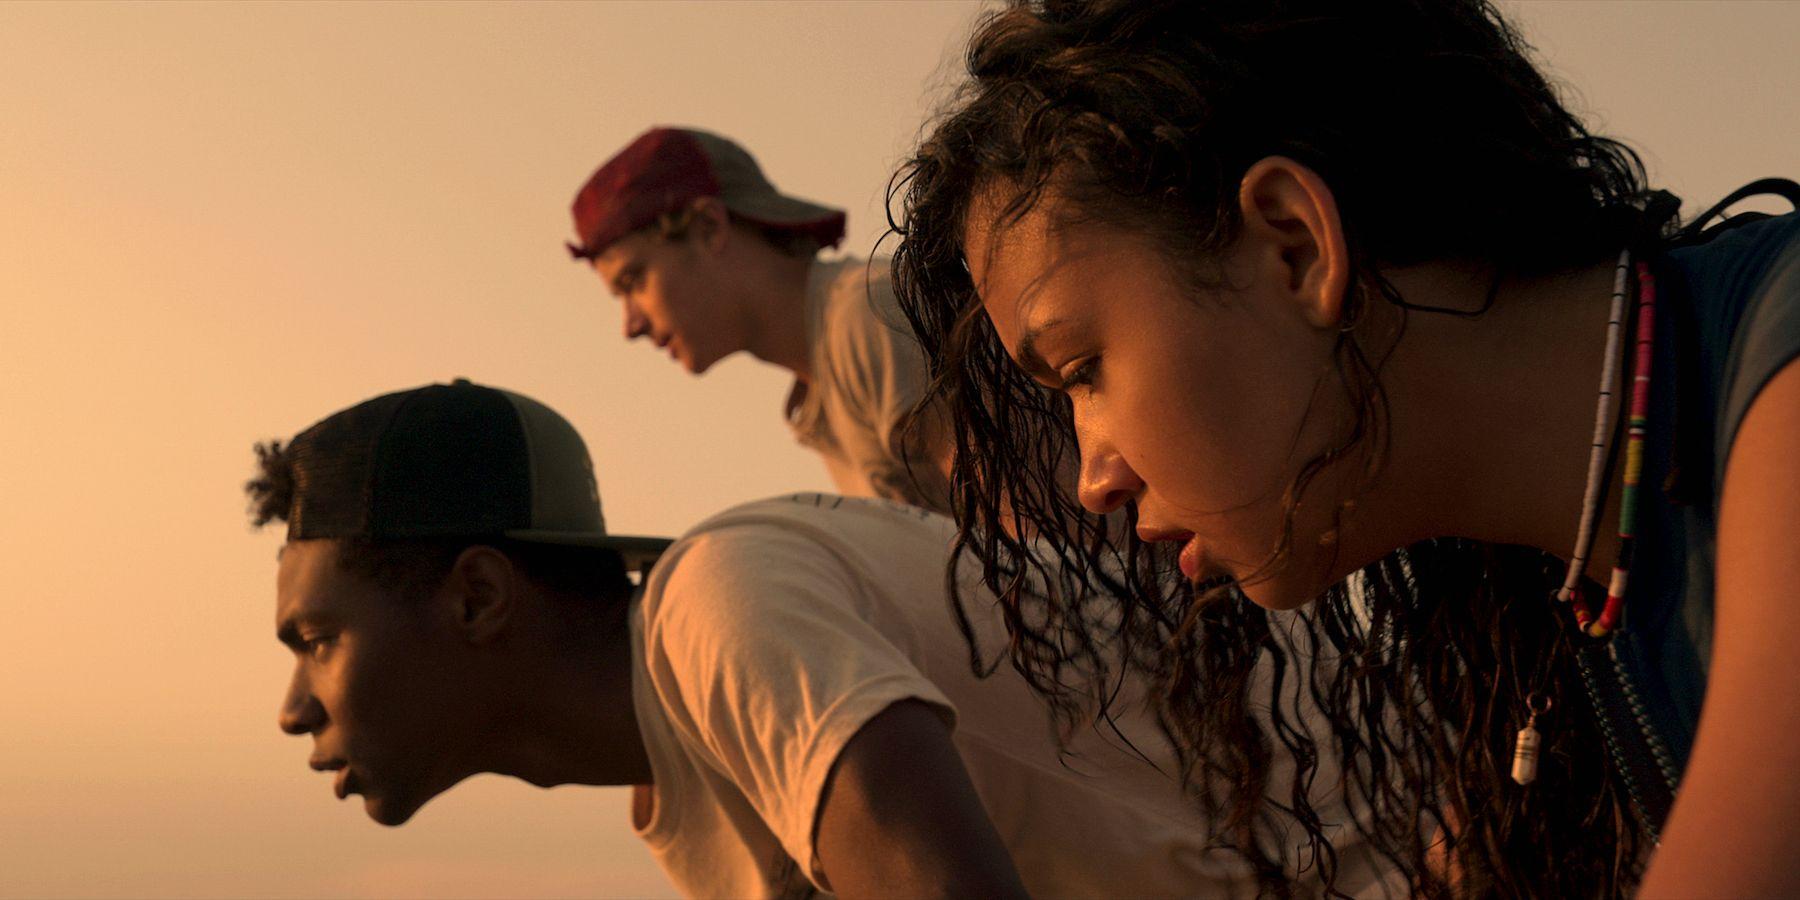 Outer Banks segunda temporada: Data de lançamento, Trailer, enredo e novidades para saber 4